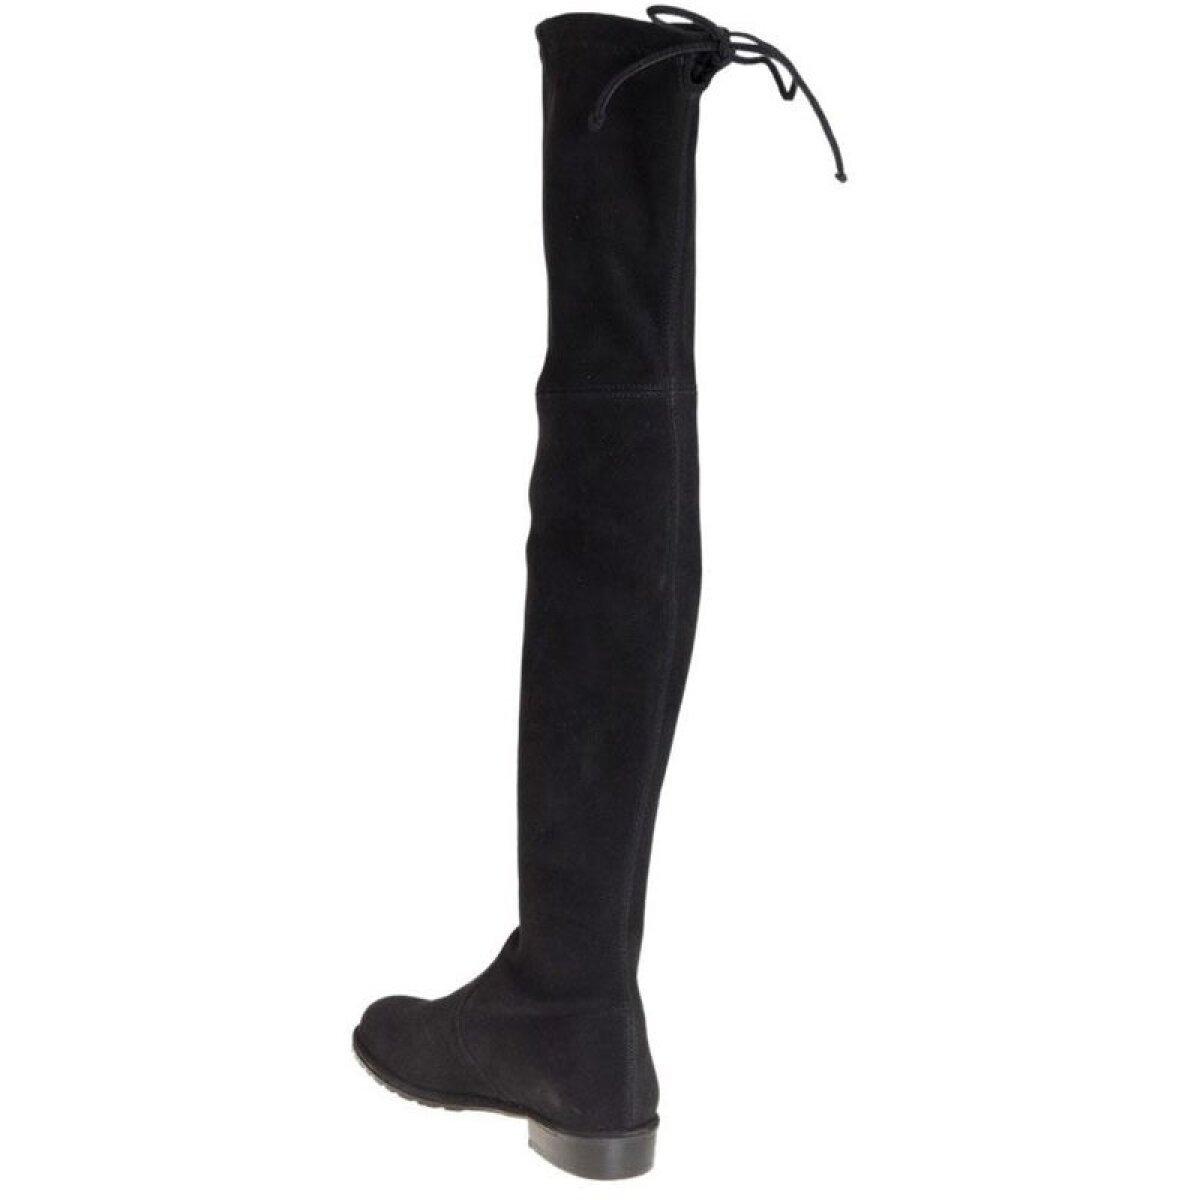 Stuаrt Weitzmаn Womens Lowland Over The Knee Boot